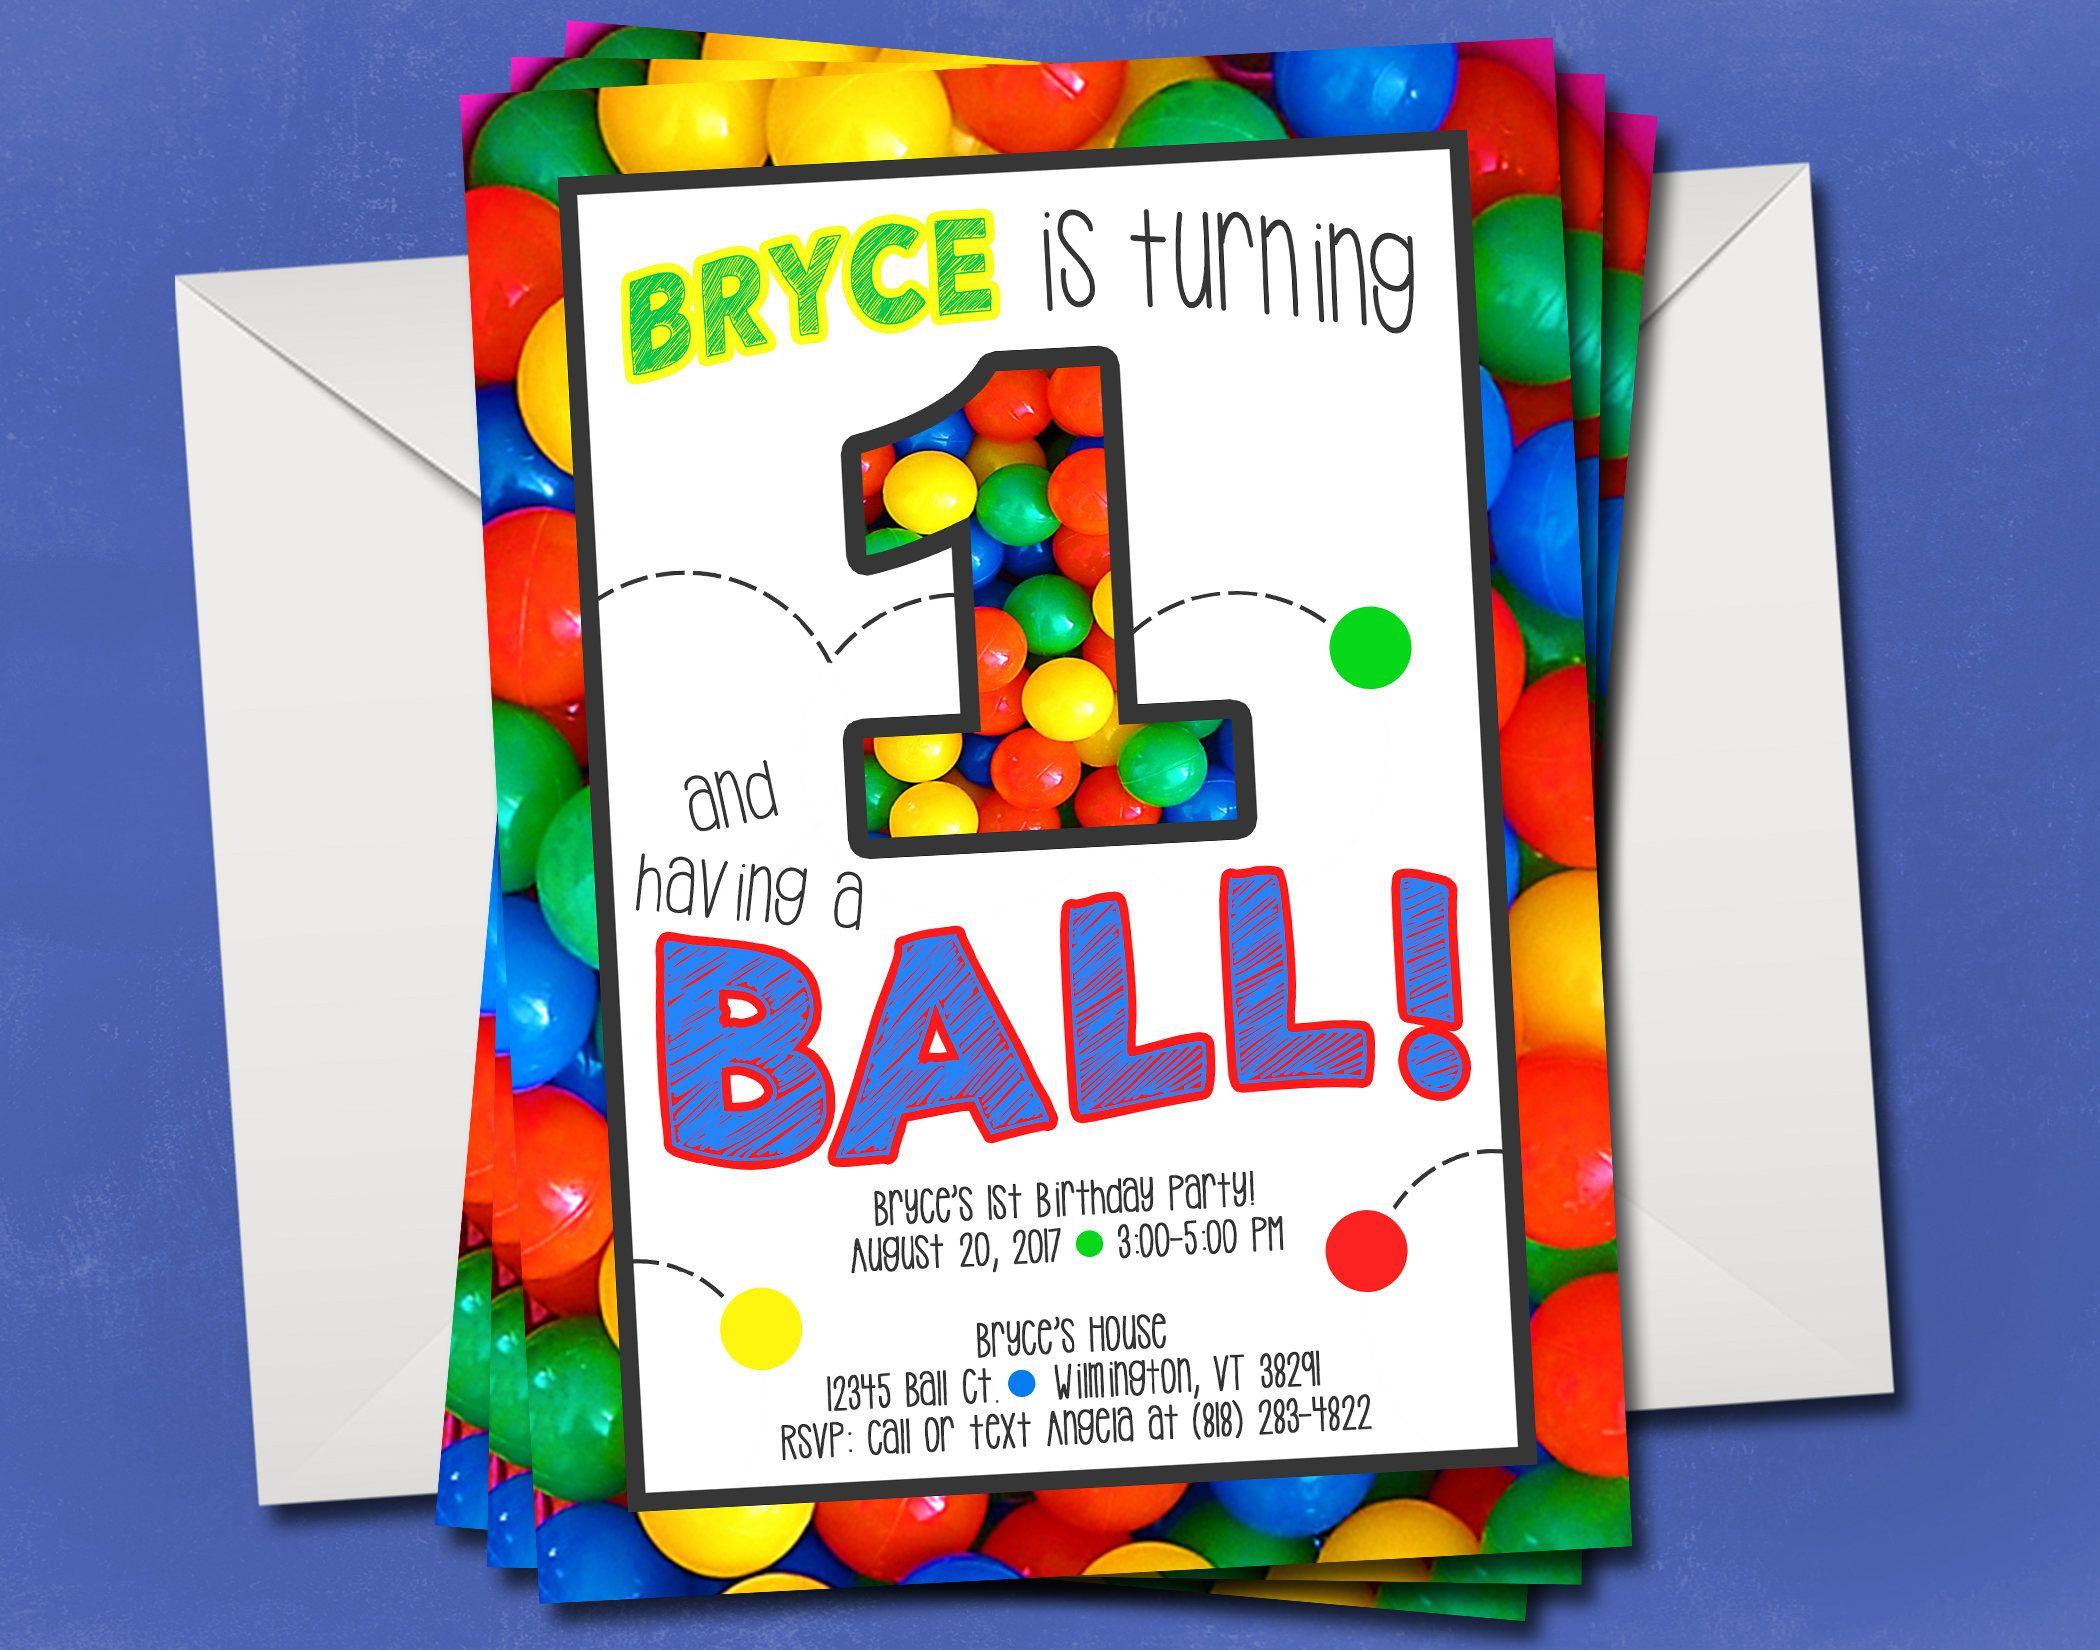 Bouncy Ball Birthday Party Invitation - 1st Birthday - Ball Pit ...